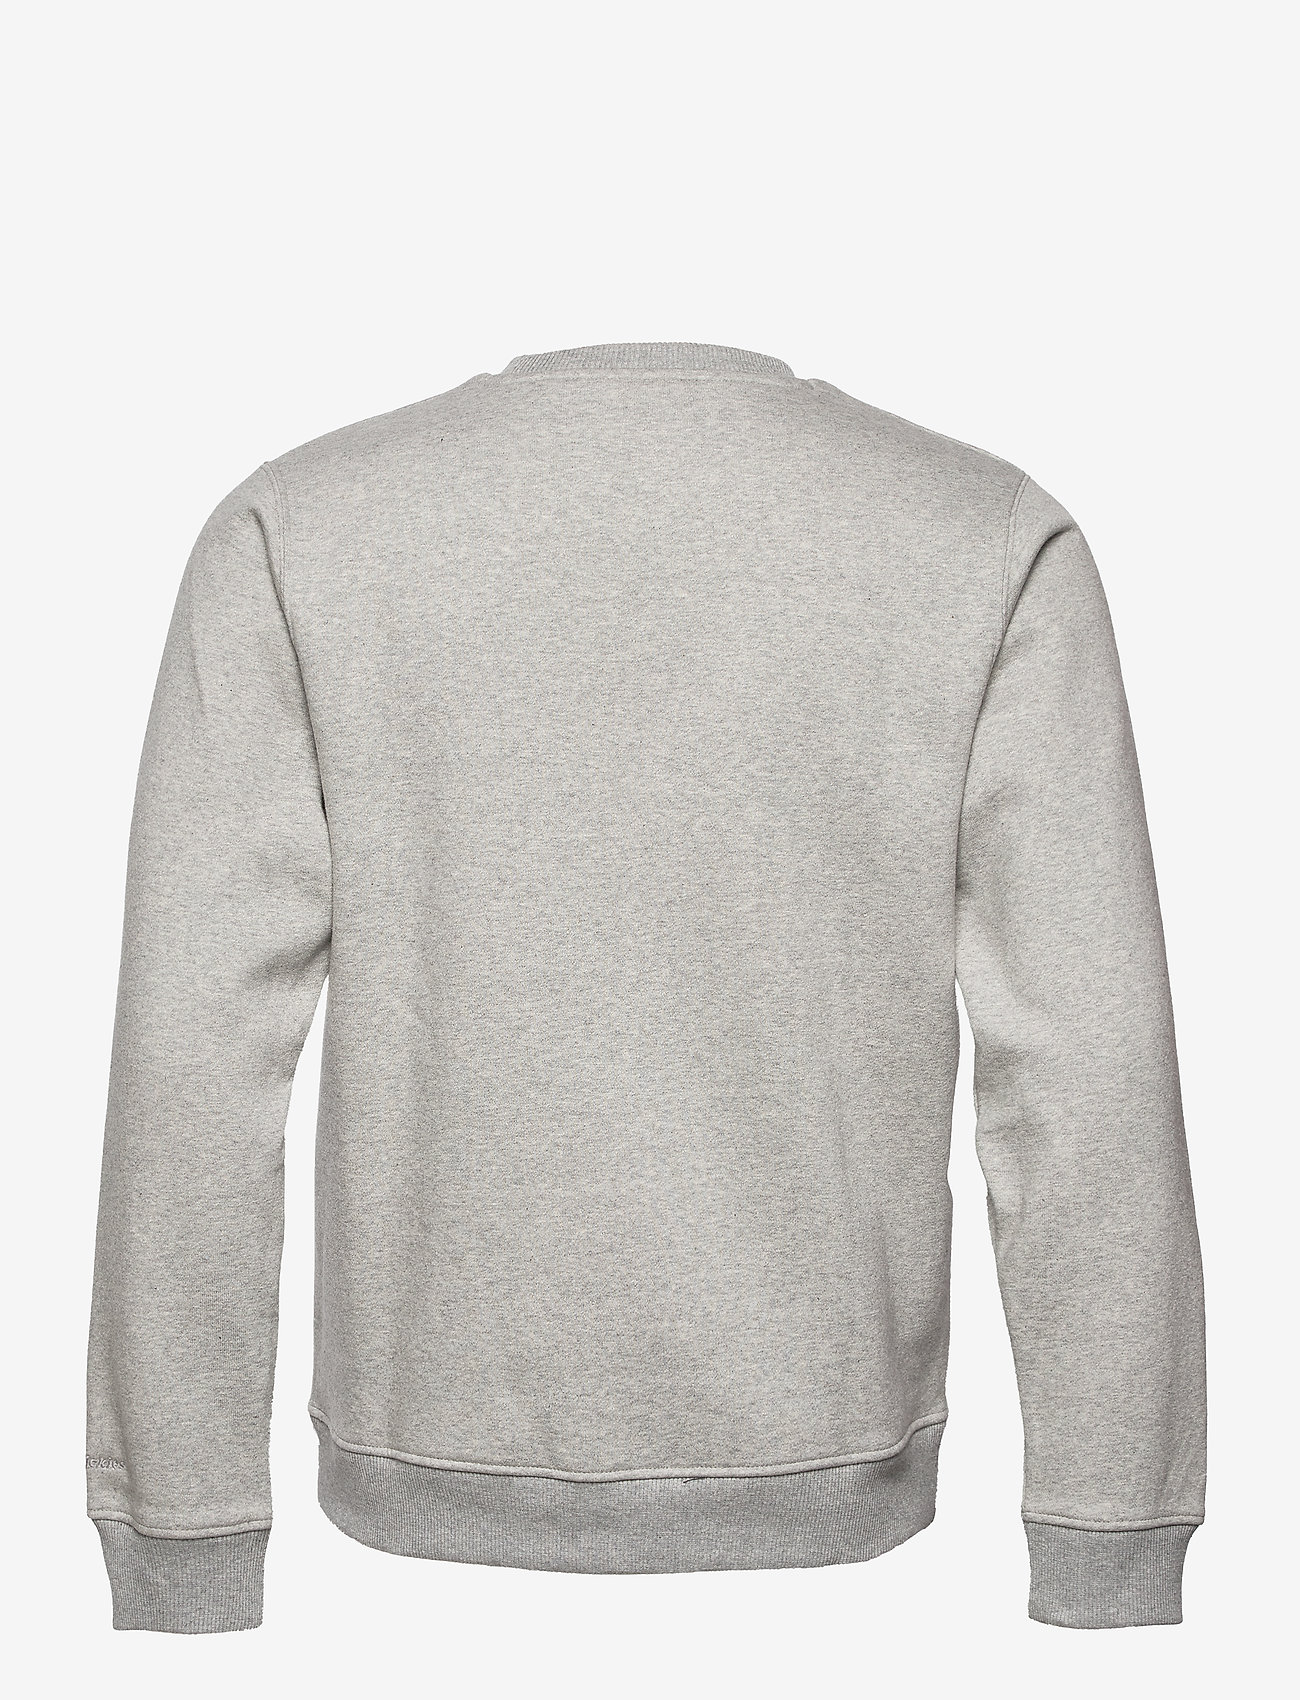 Dickies NEW JERSEY - Sweatshirts GREY MELANGE - Menn Klær